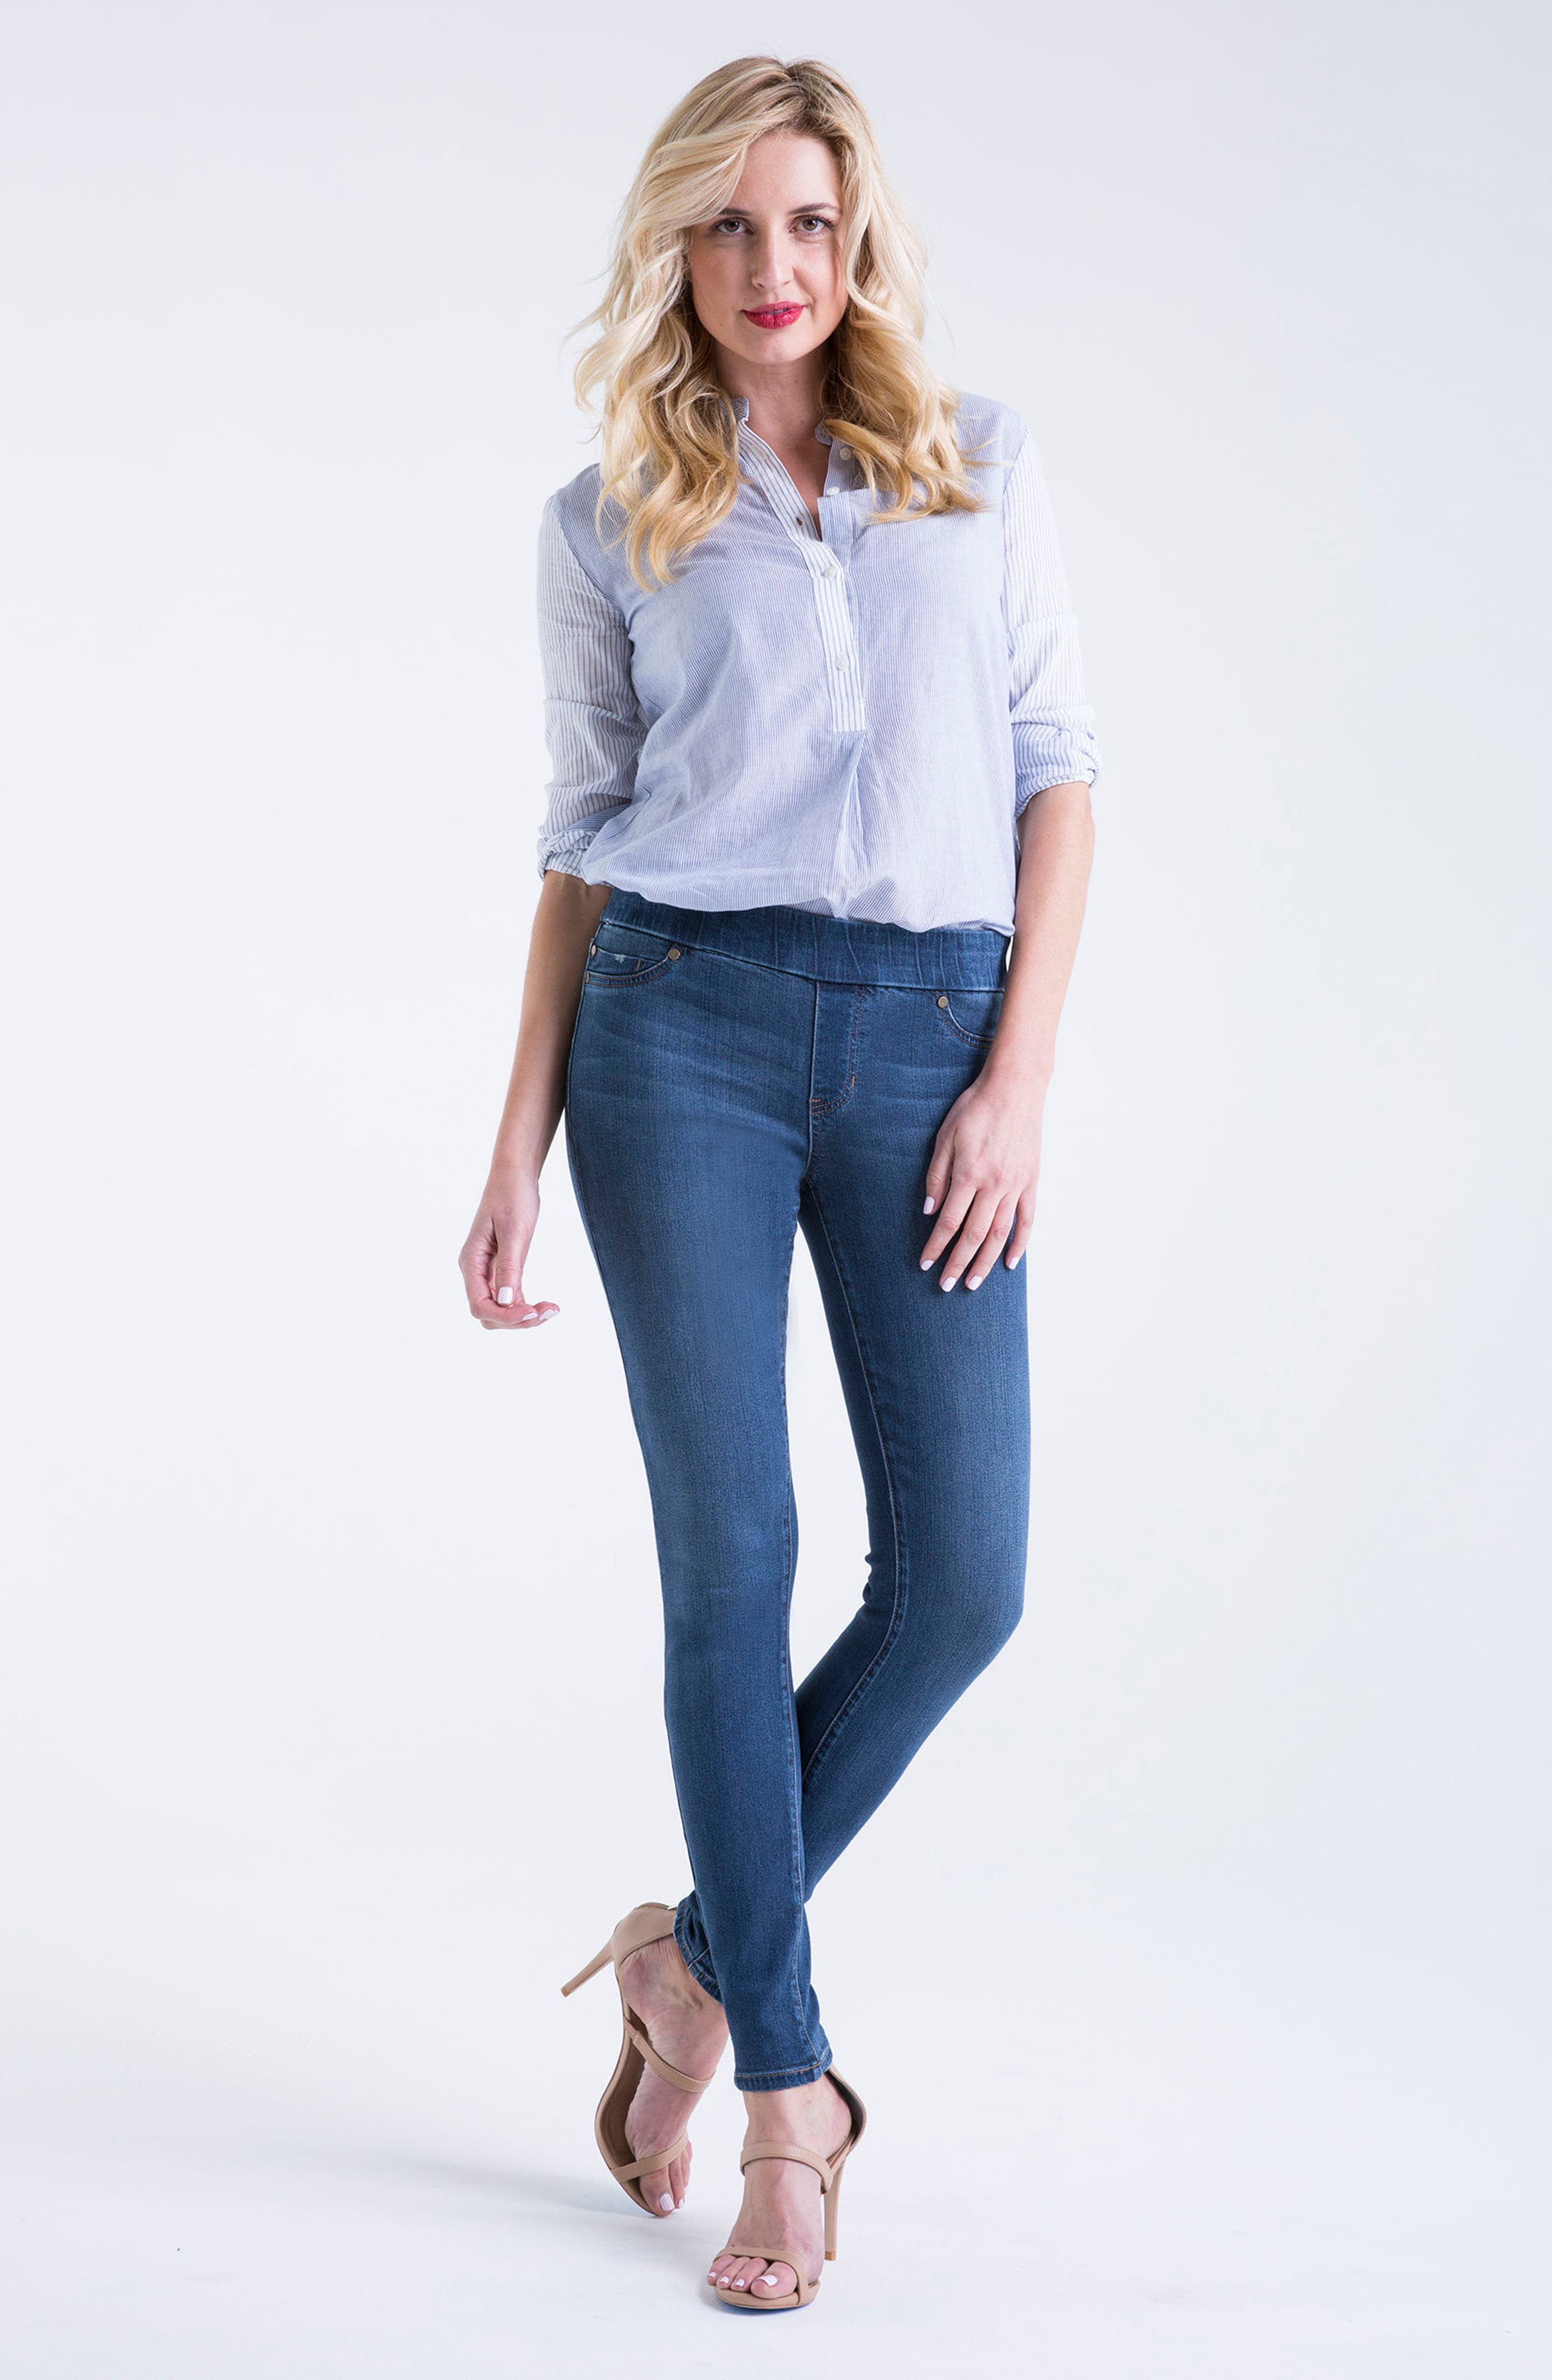 Jeans Company Sienna Mid Rise Soft Stretch Denim Leggings,                             Alternate thumbnail 19, color,